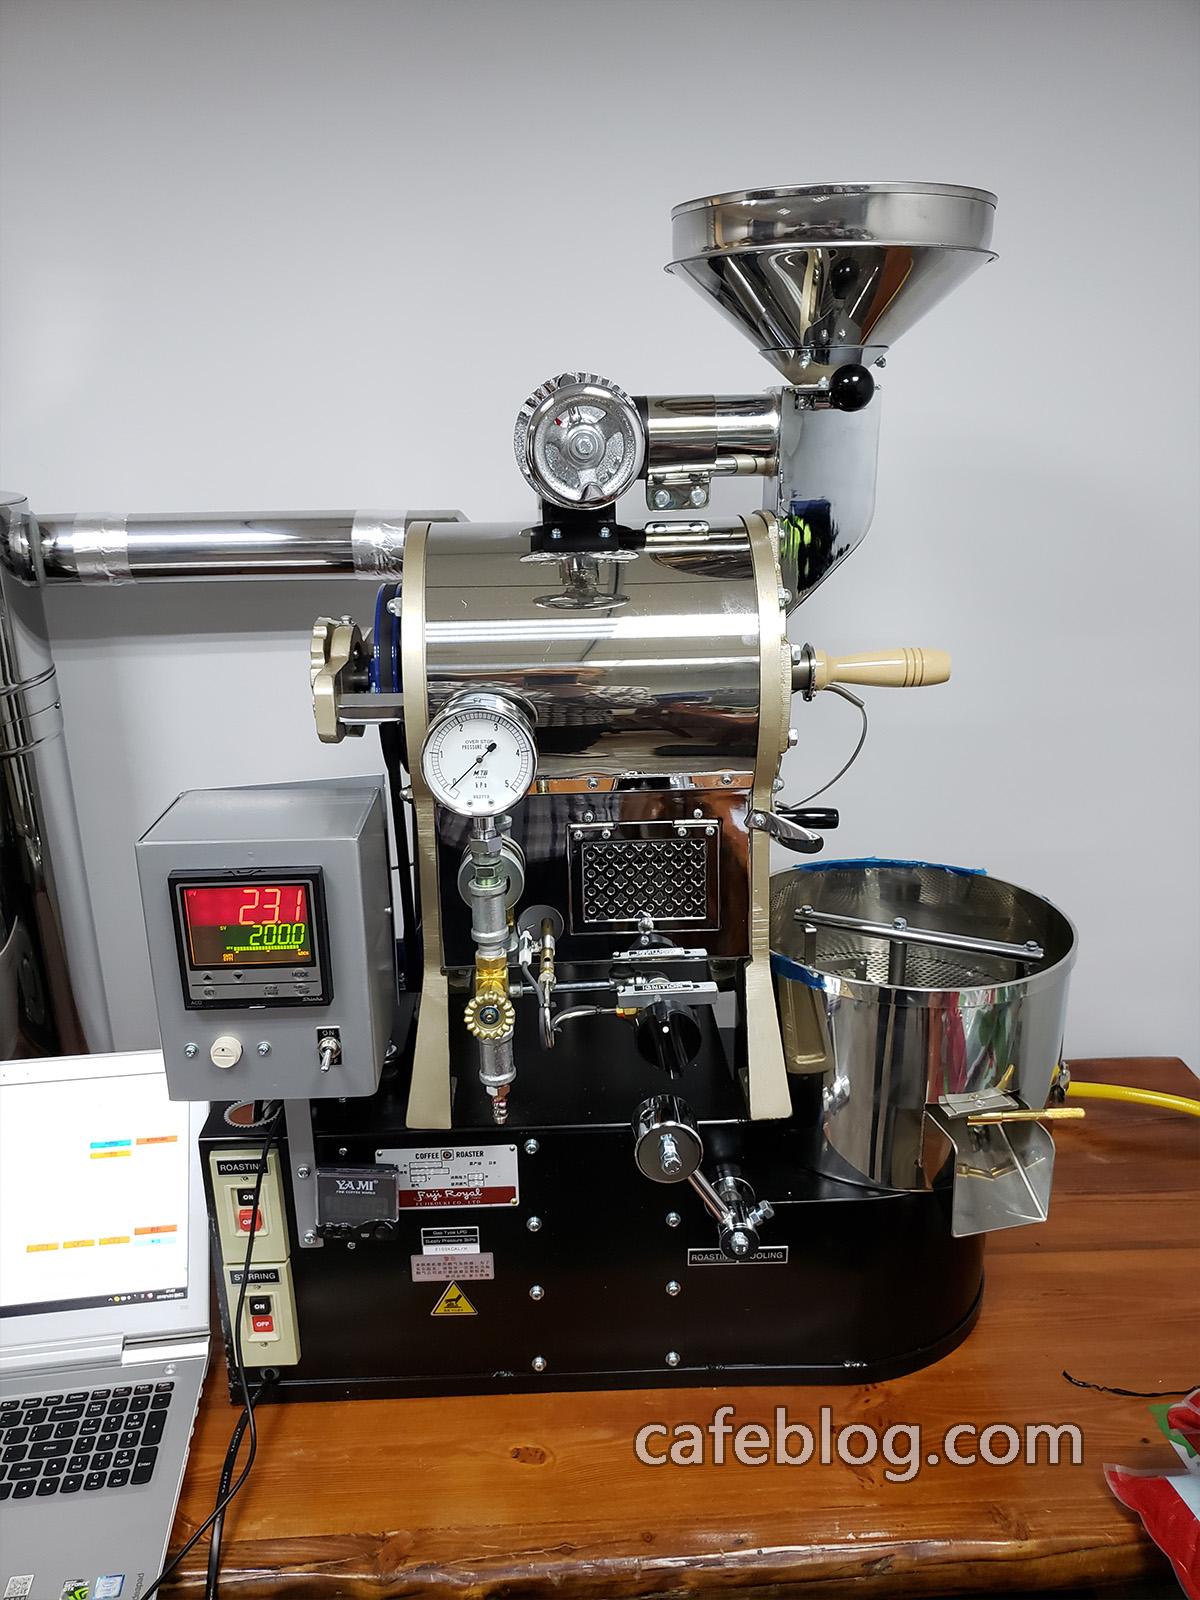 R-101咖啡烘焙机(1公斤)咖啡烘焙机安装完毕。